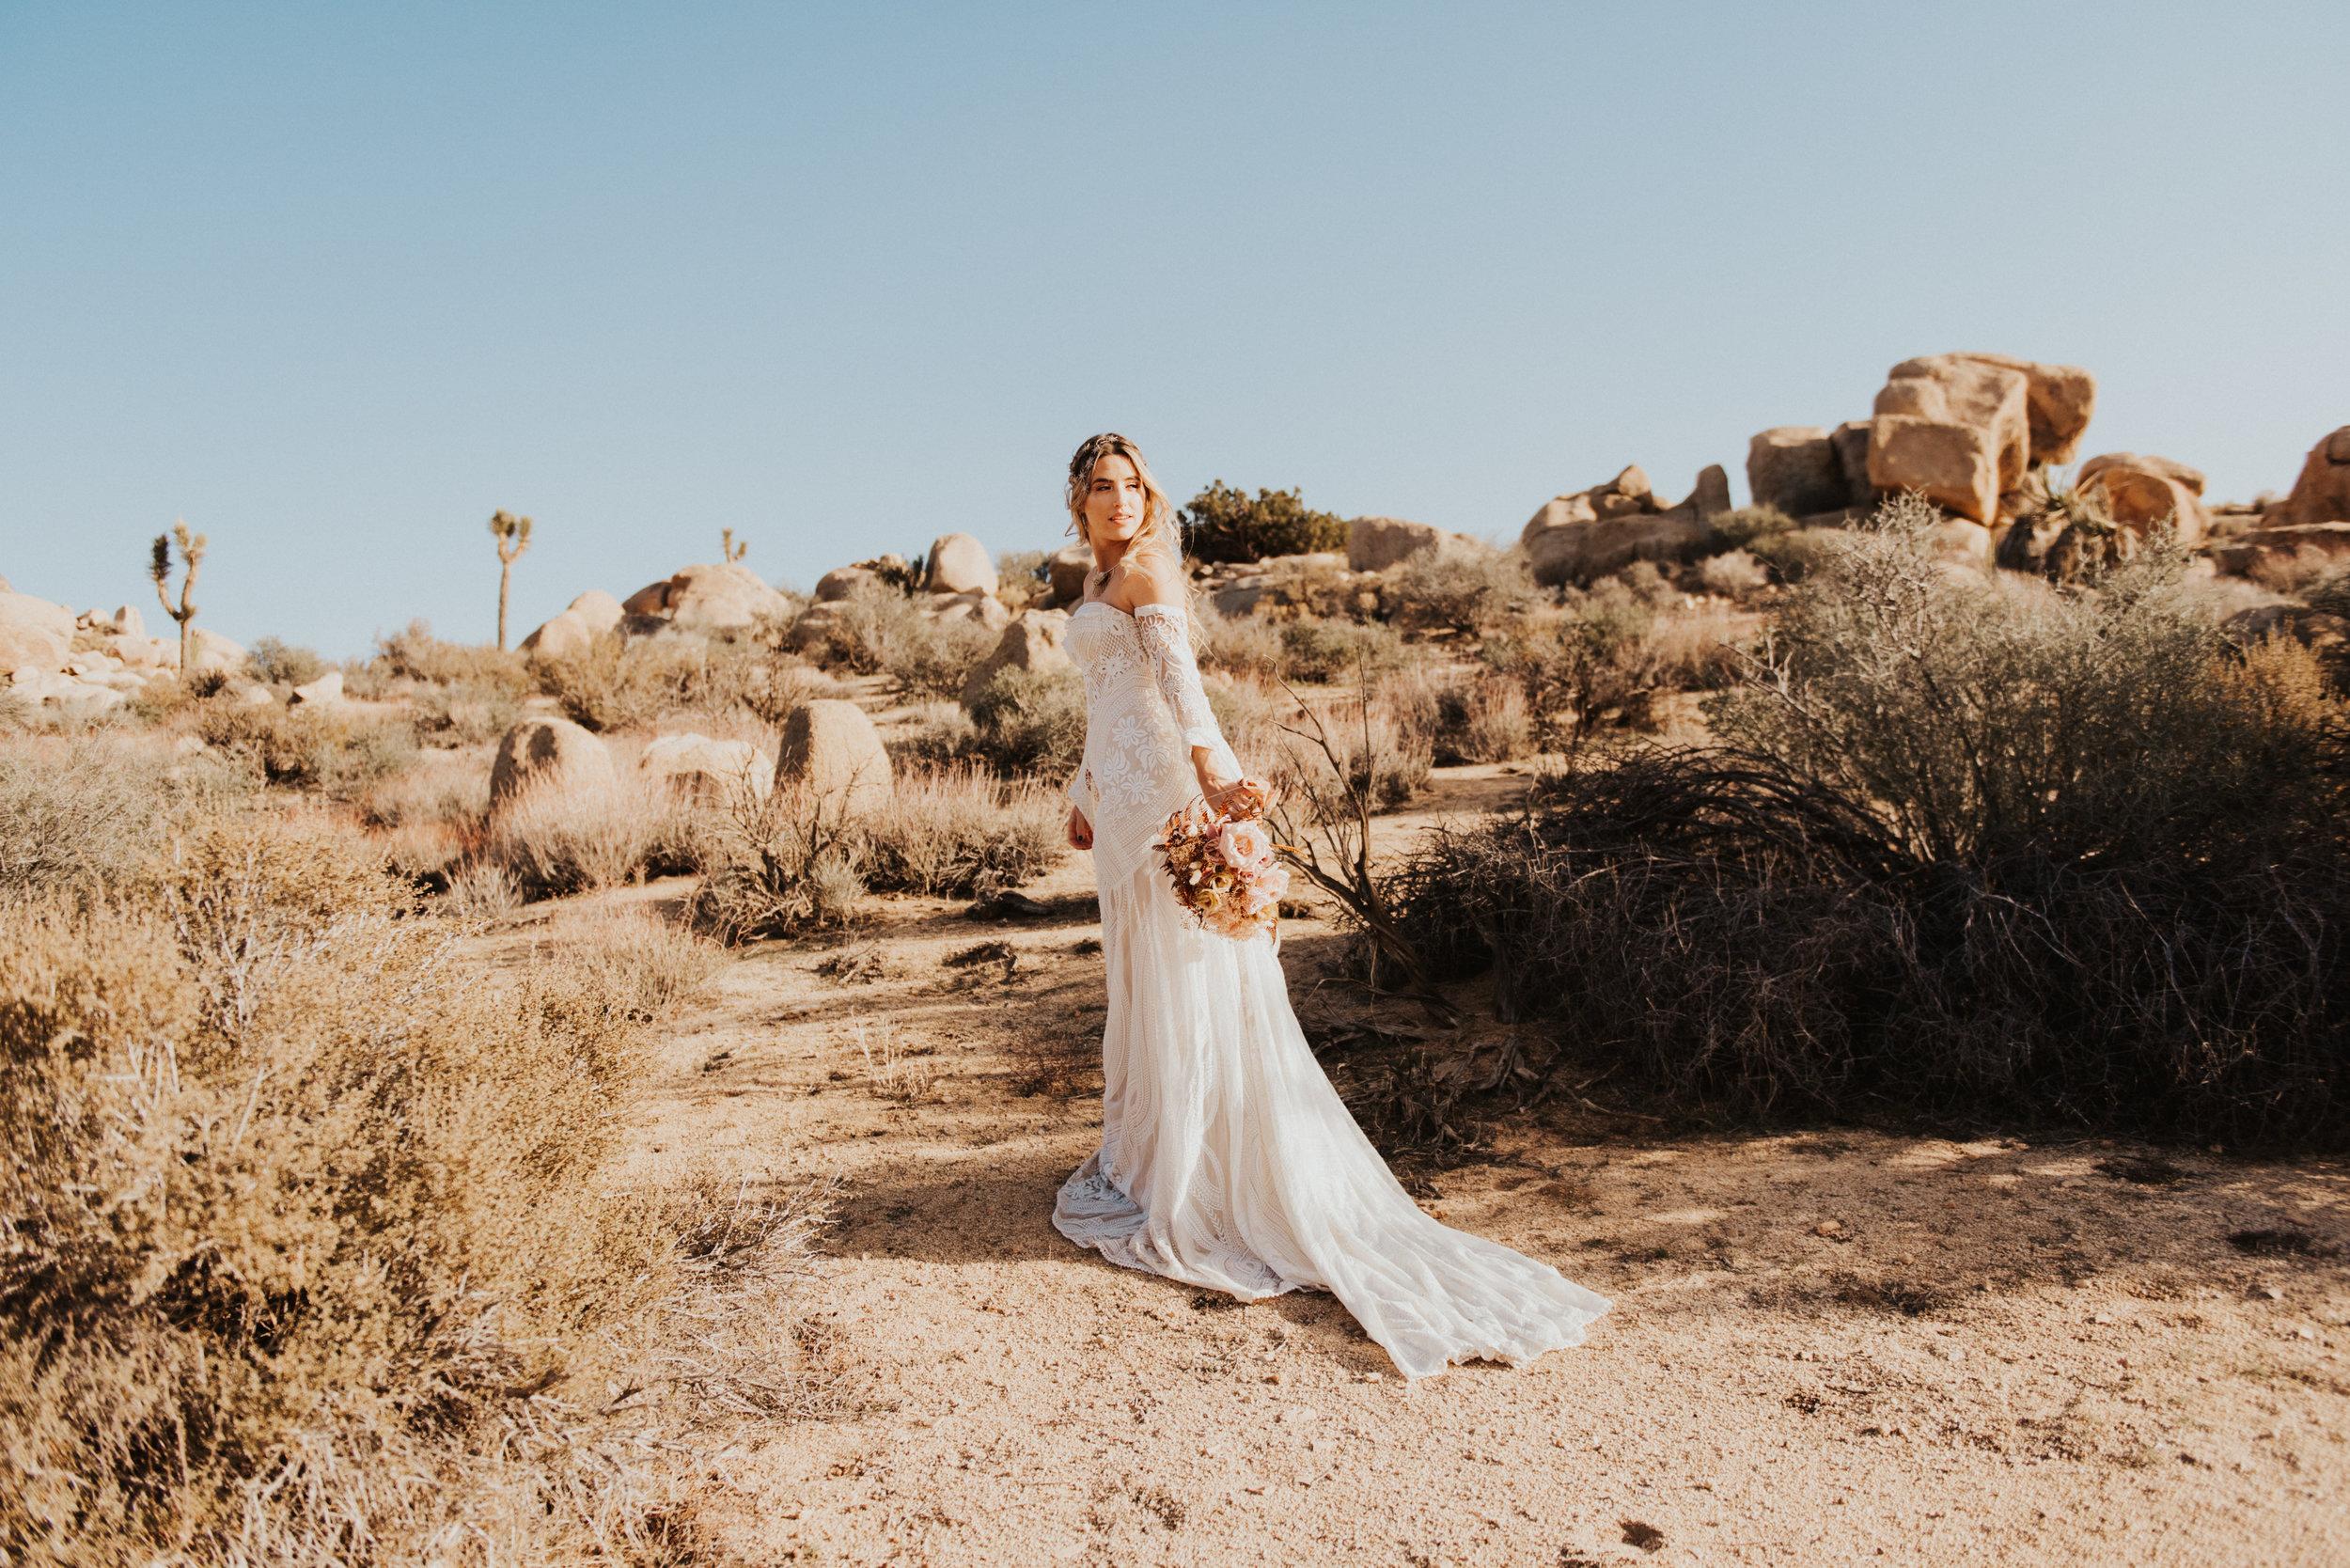 FortSt.John_photographer_TyraEPhotography_Wedding_Couple_Family_Photograhy_DawsonCreek_Elopement_Bride_Boduoir_Portraits-4883.jpg